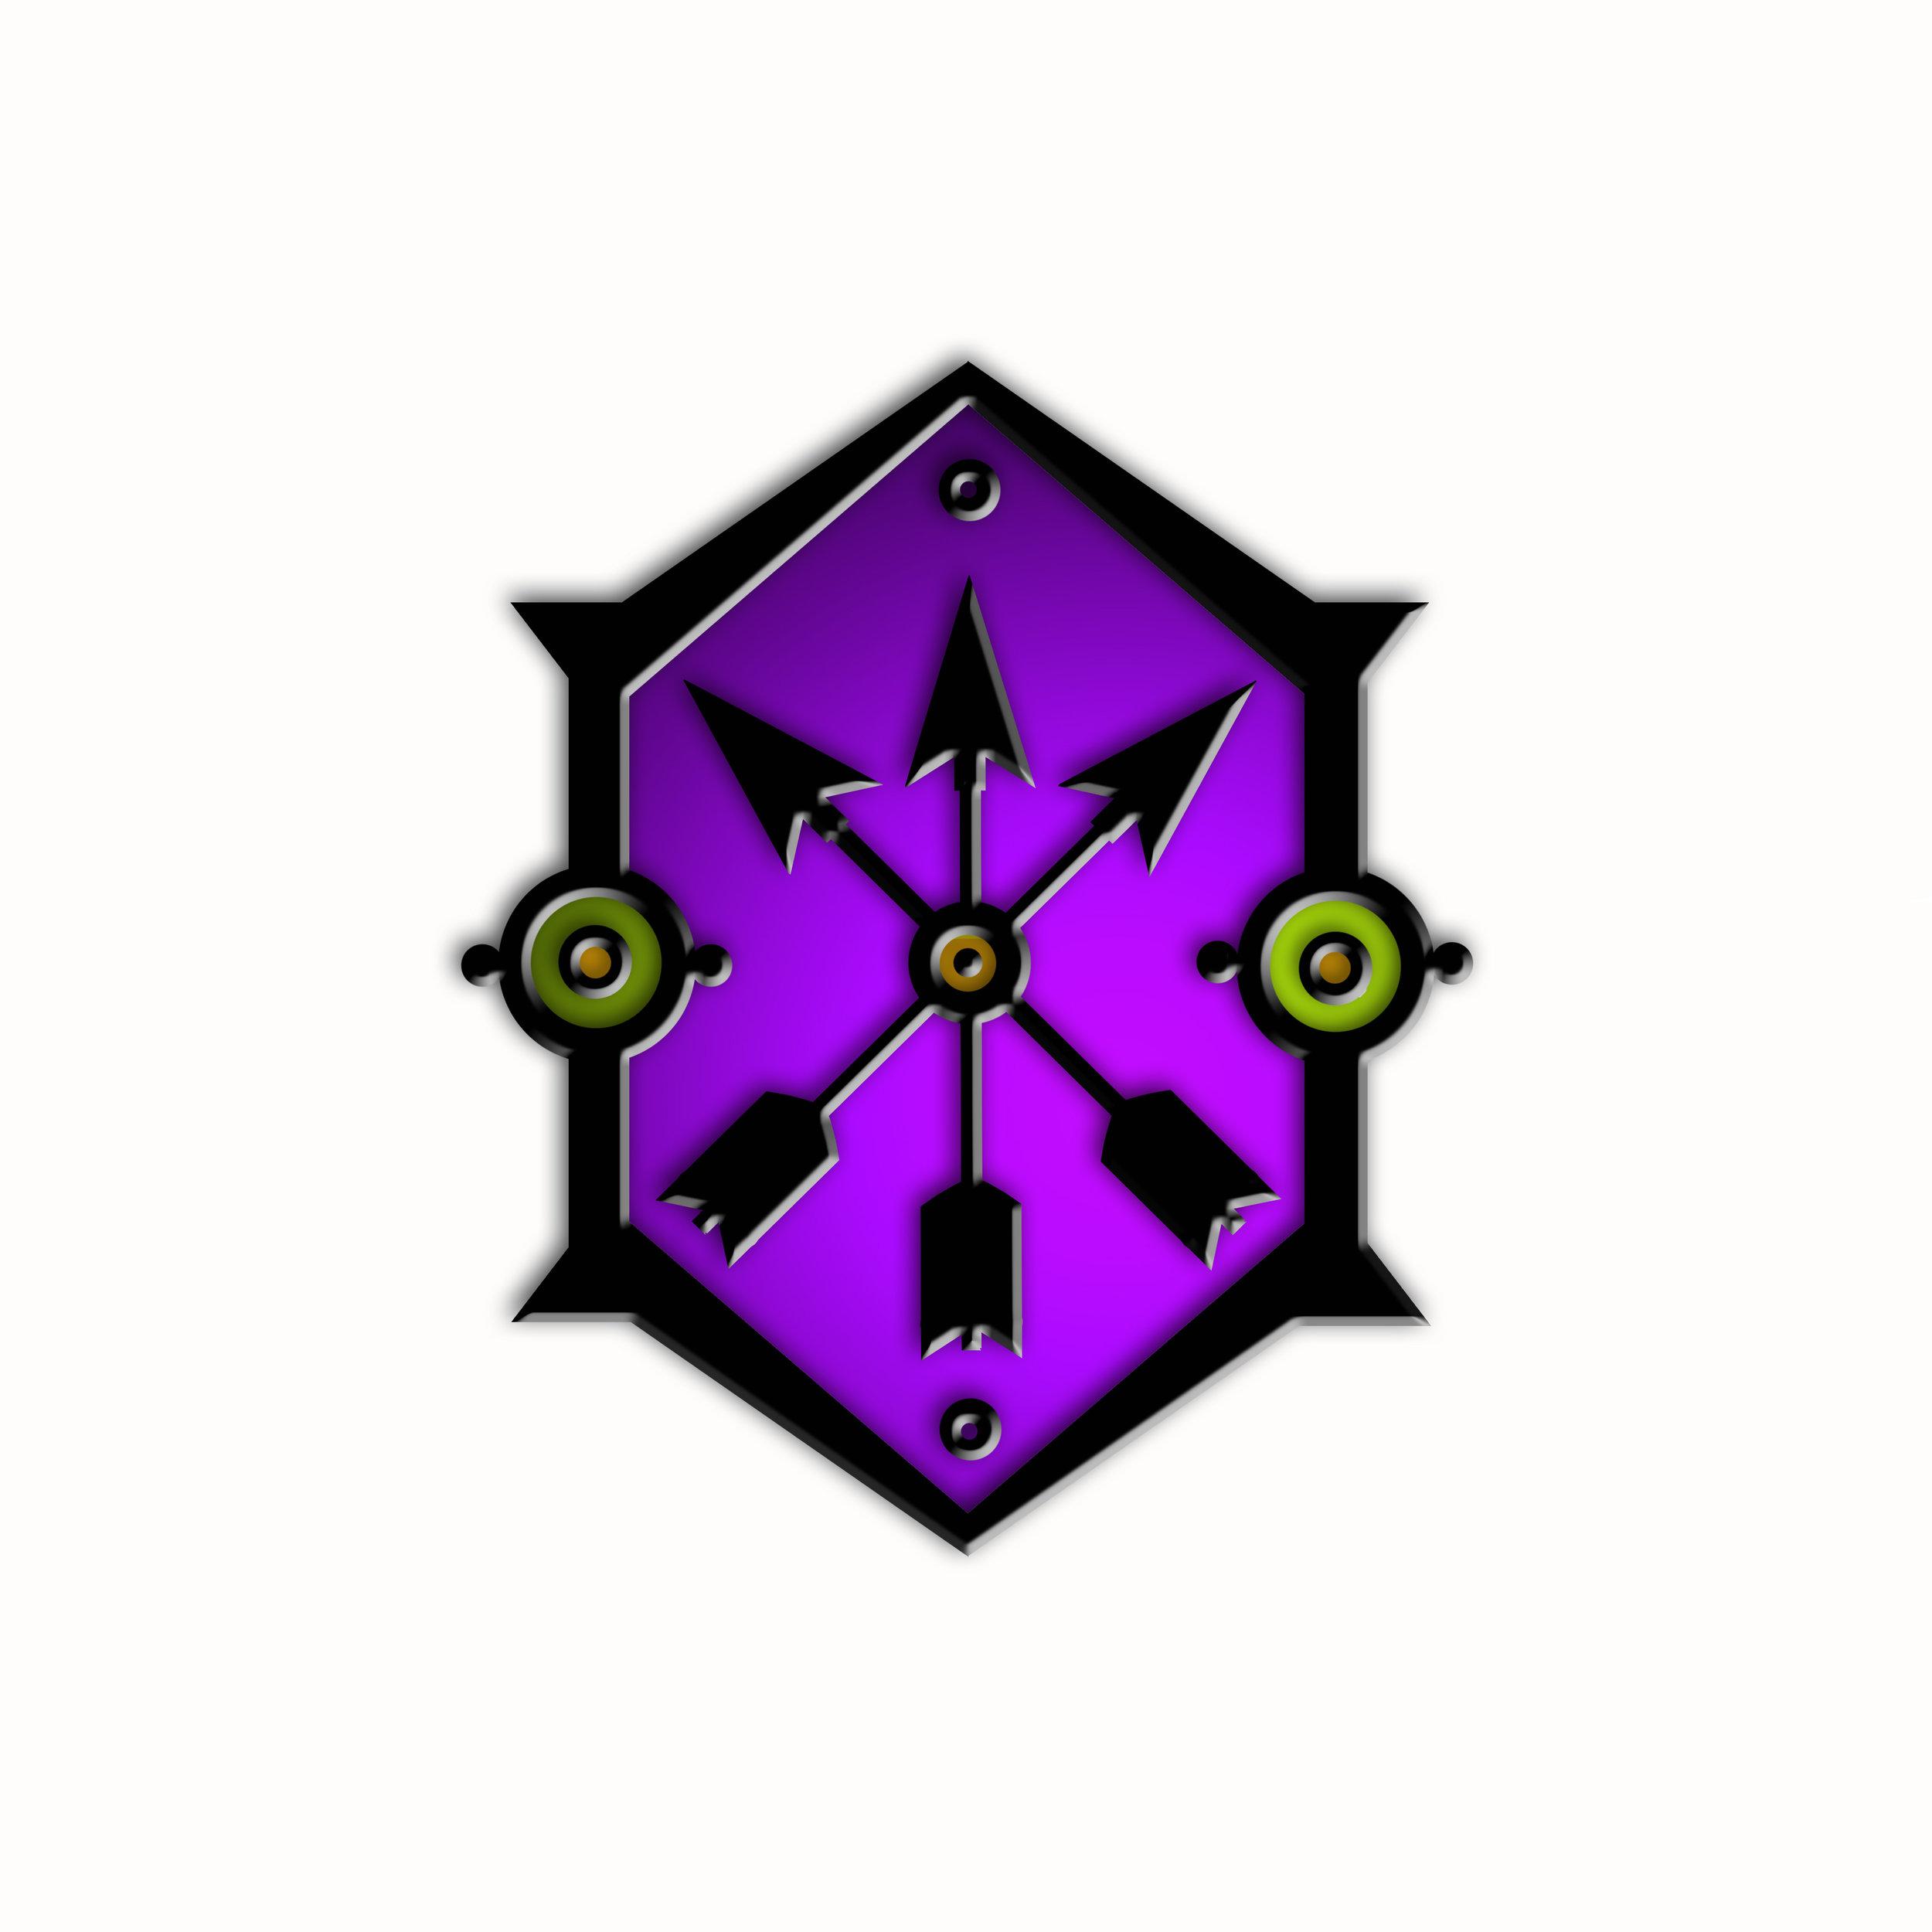 Motif-arrow-4-site.jpg